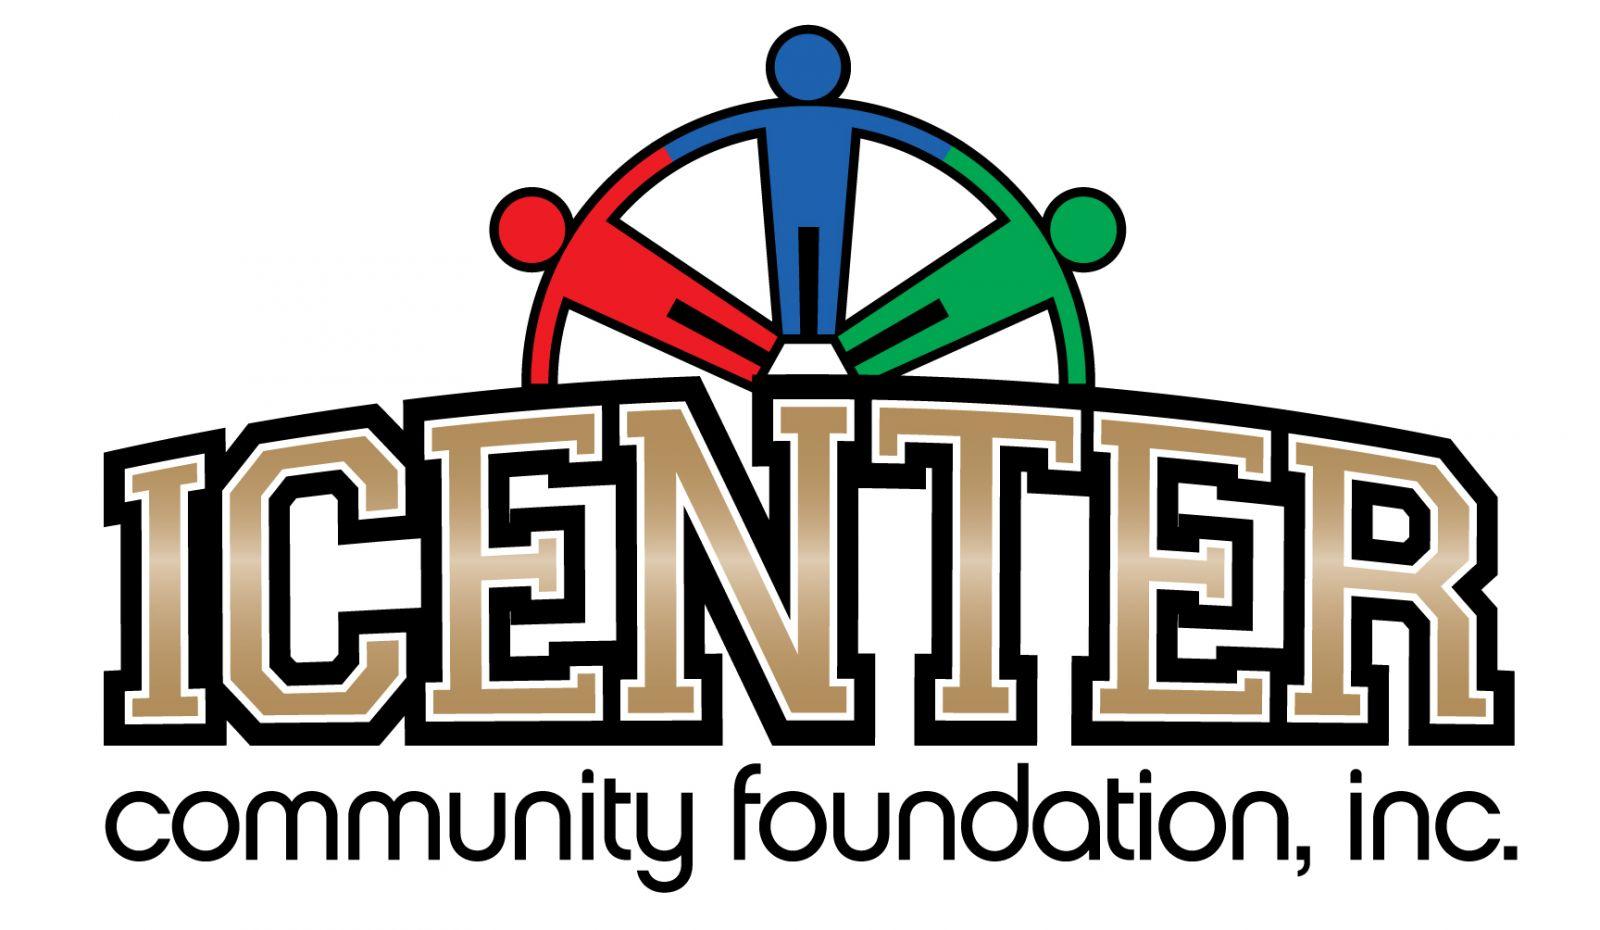 iCenter Foundation